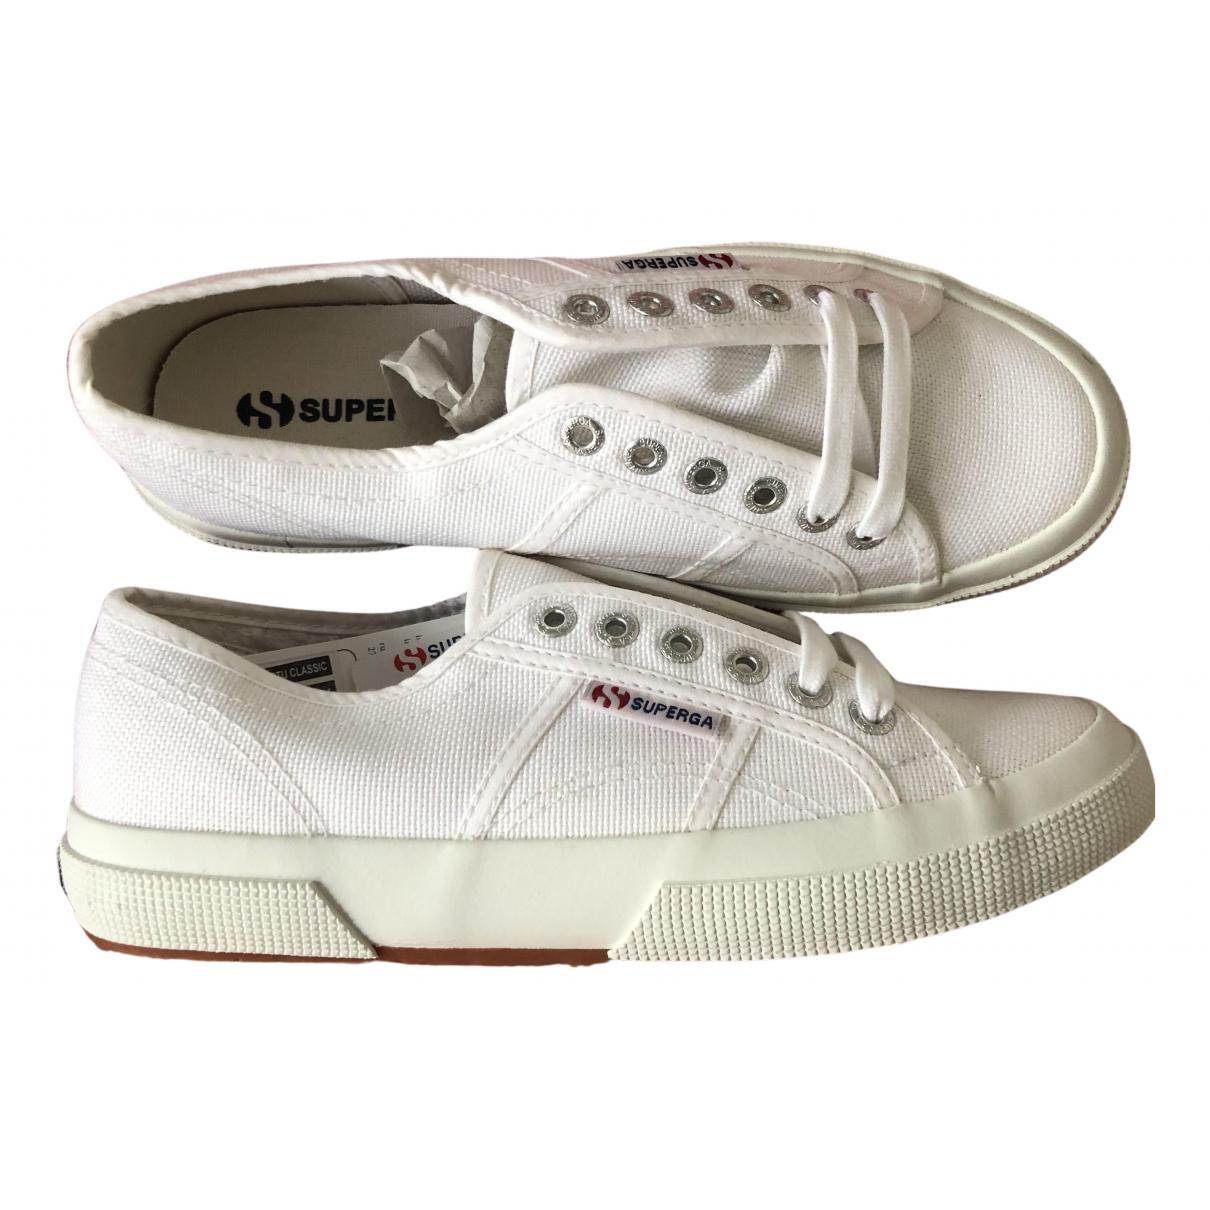 Superga N White Cloth Trainers for Women 39 EU